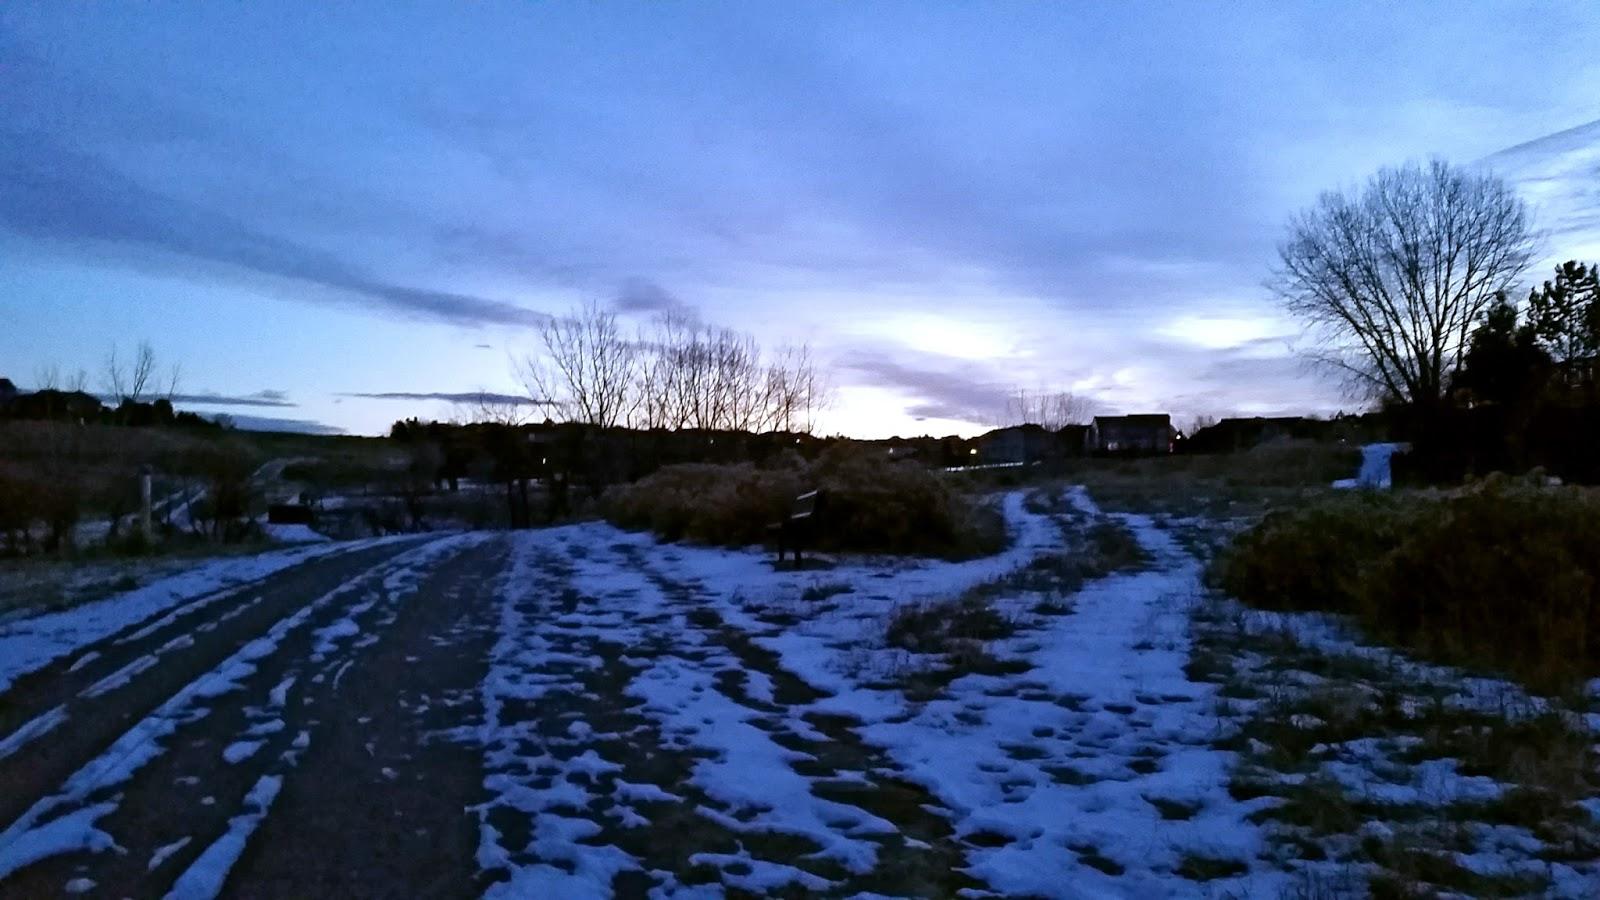 winter solstice - photo #39